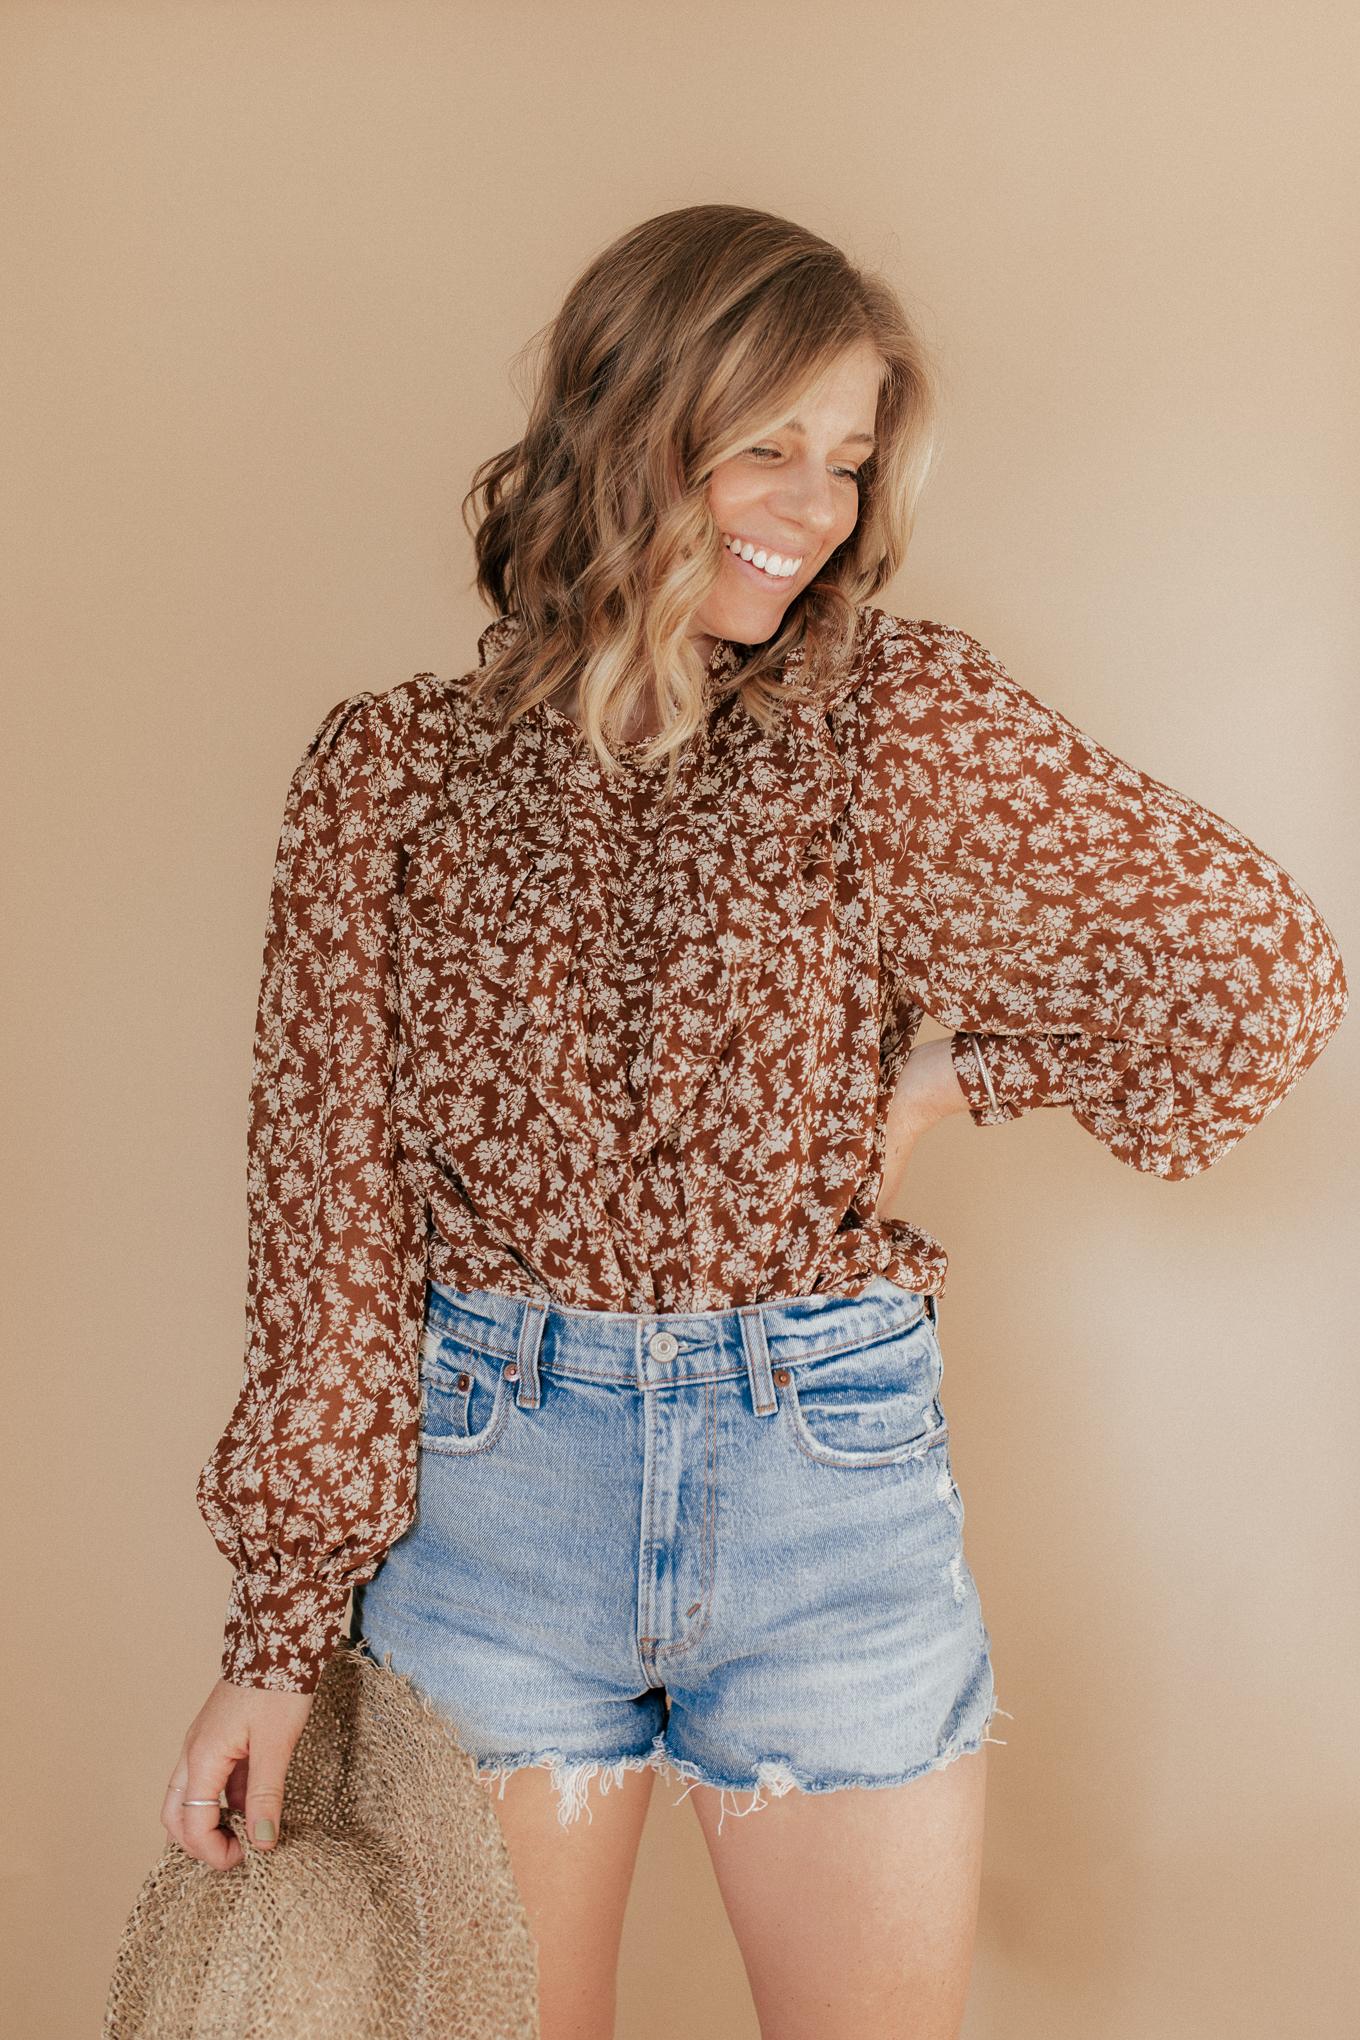 Abercrombie Denim Shorts Guide | Louella Reese